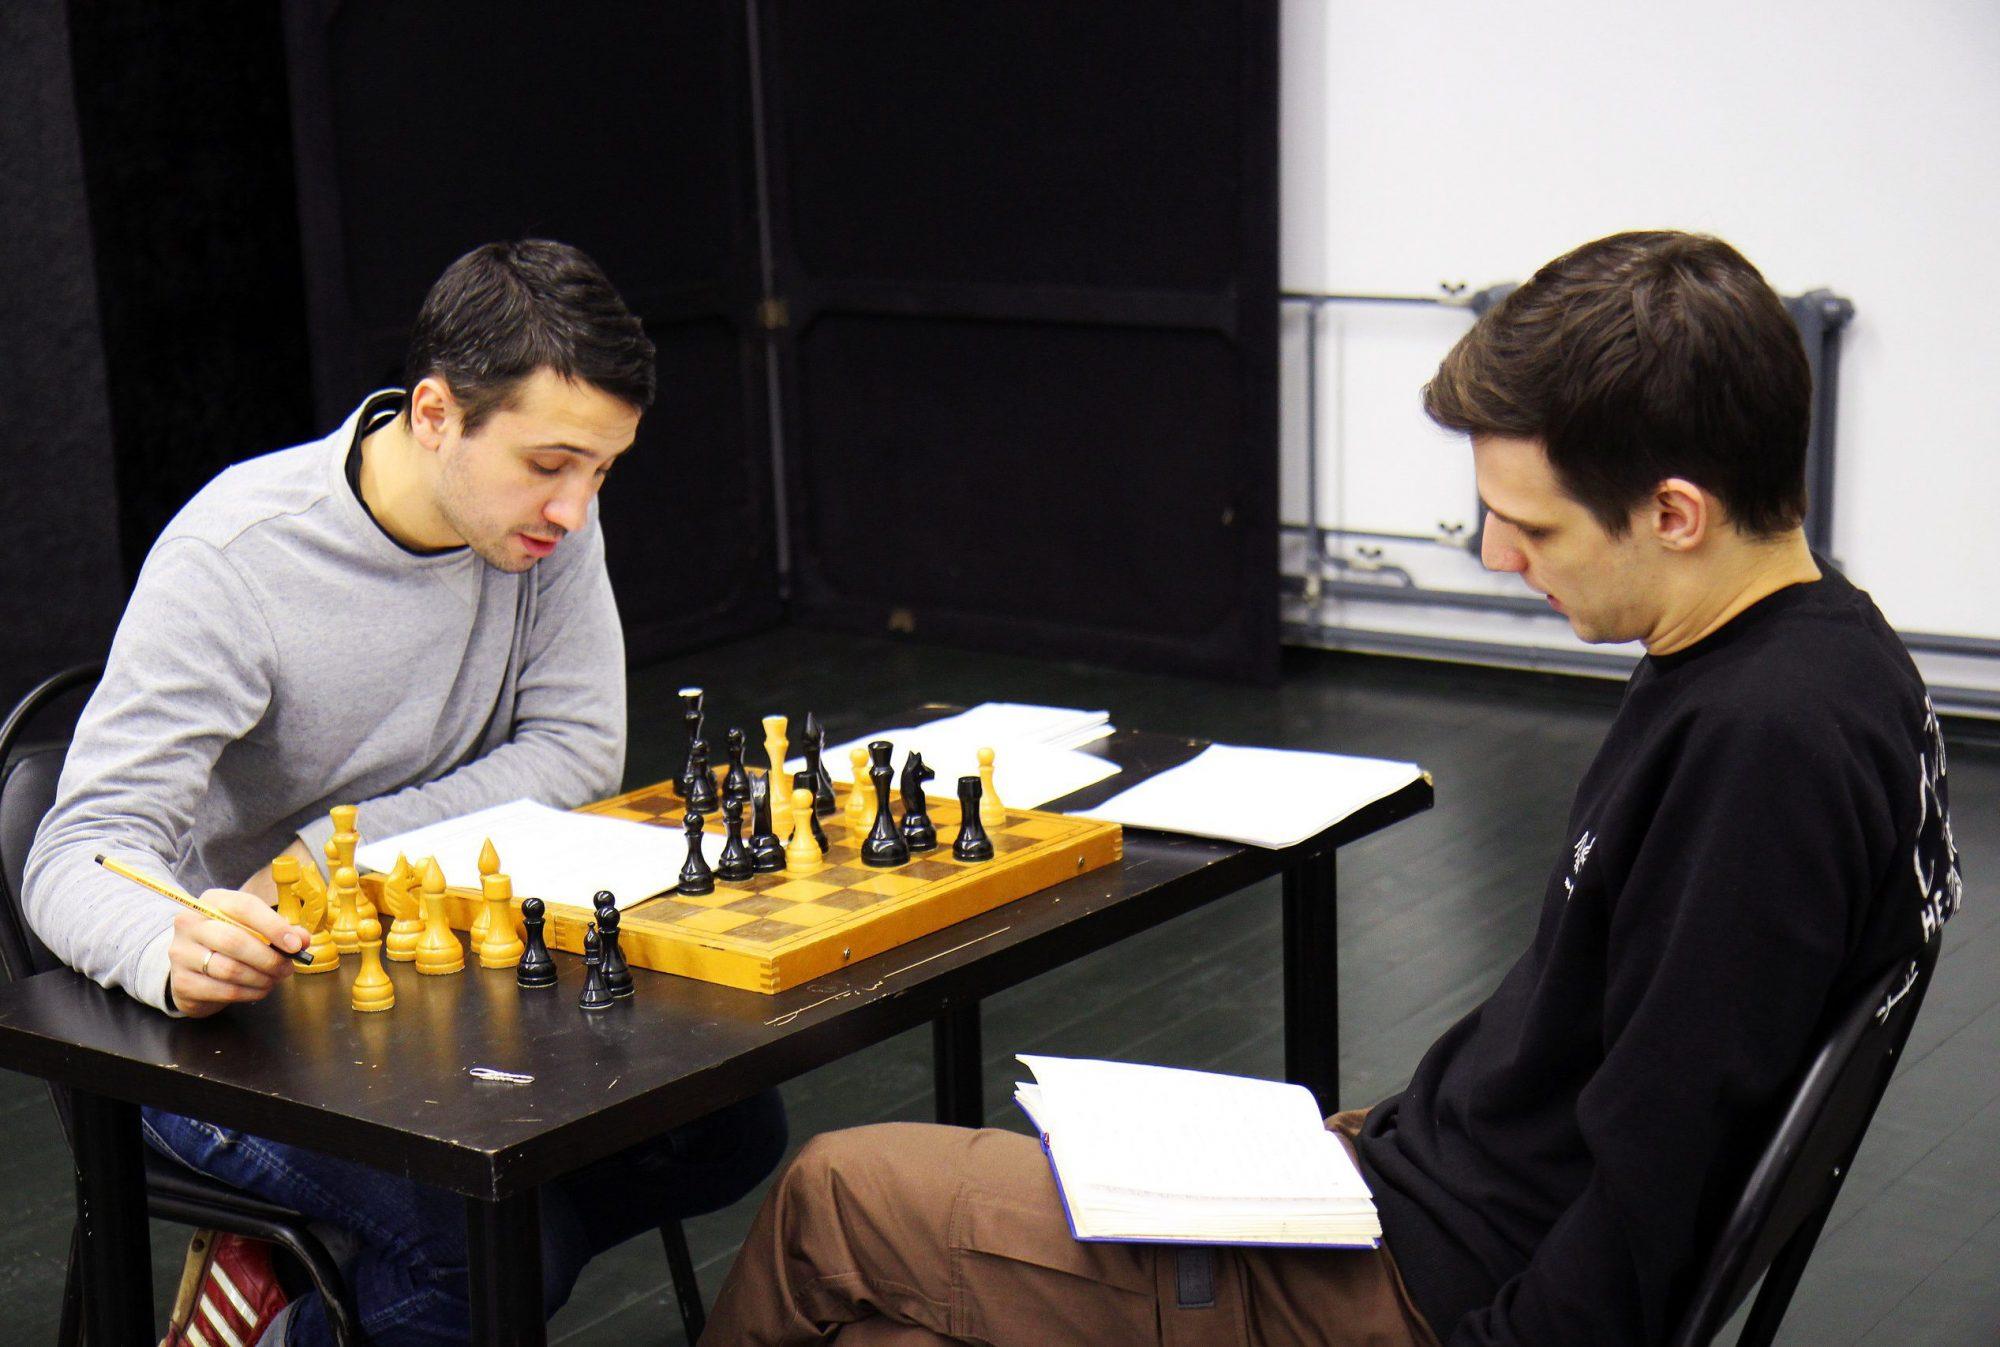 Андрей Слепухин и Иван Стрюк. Фото предоставлено пресс-службой ТЮЗа